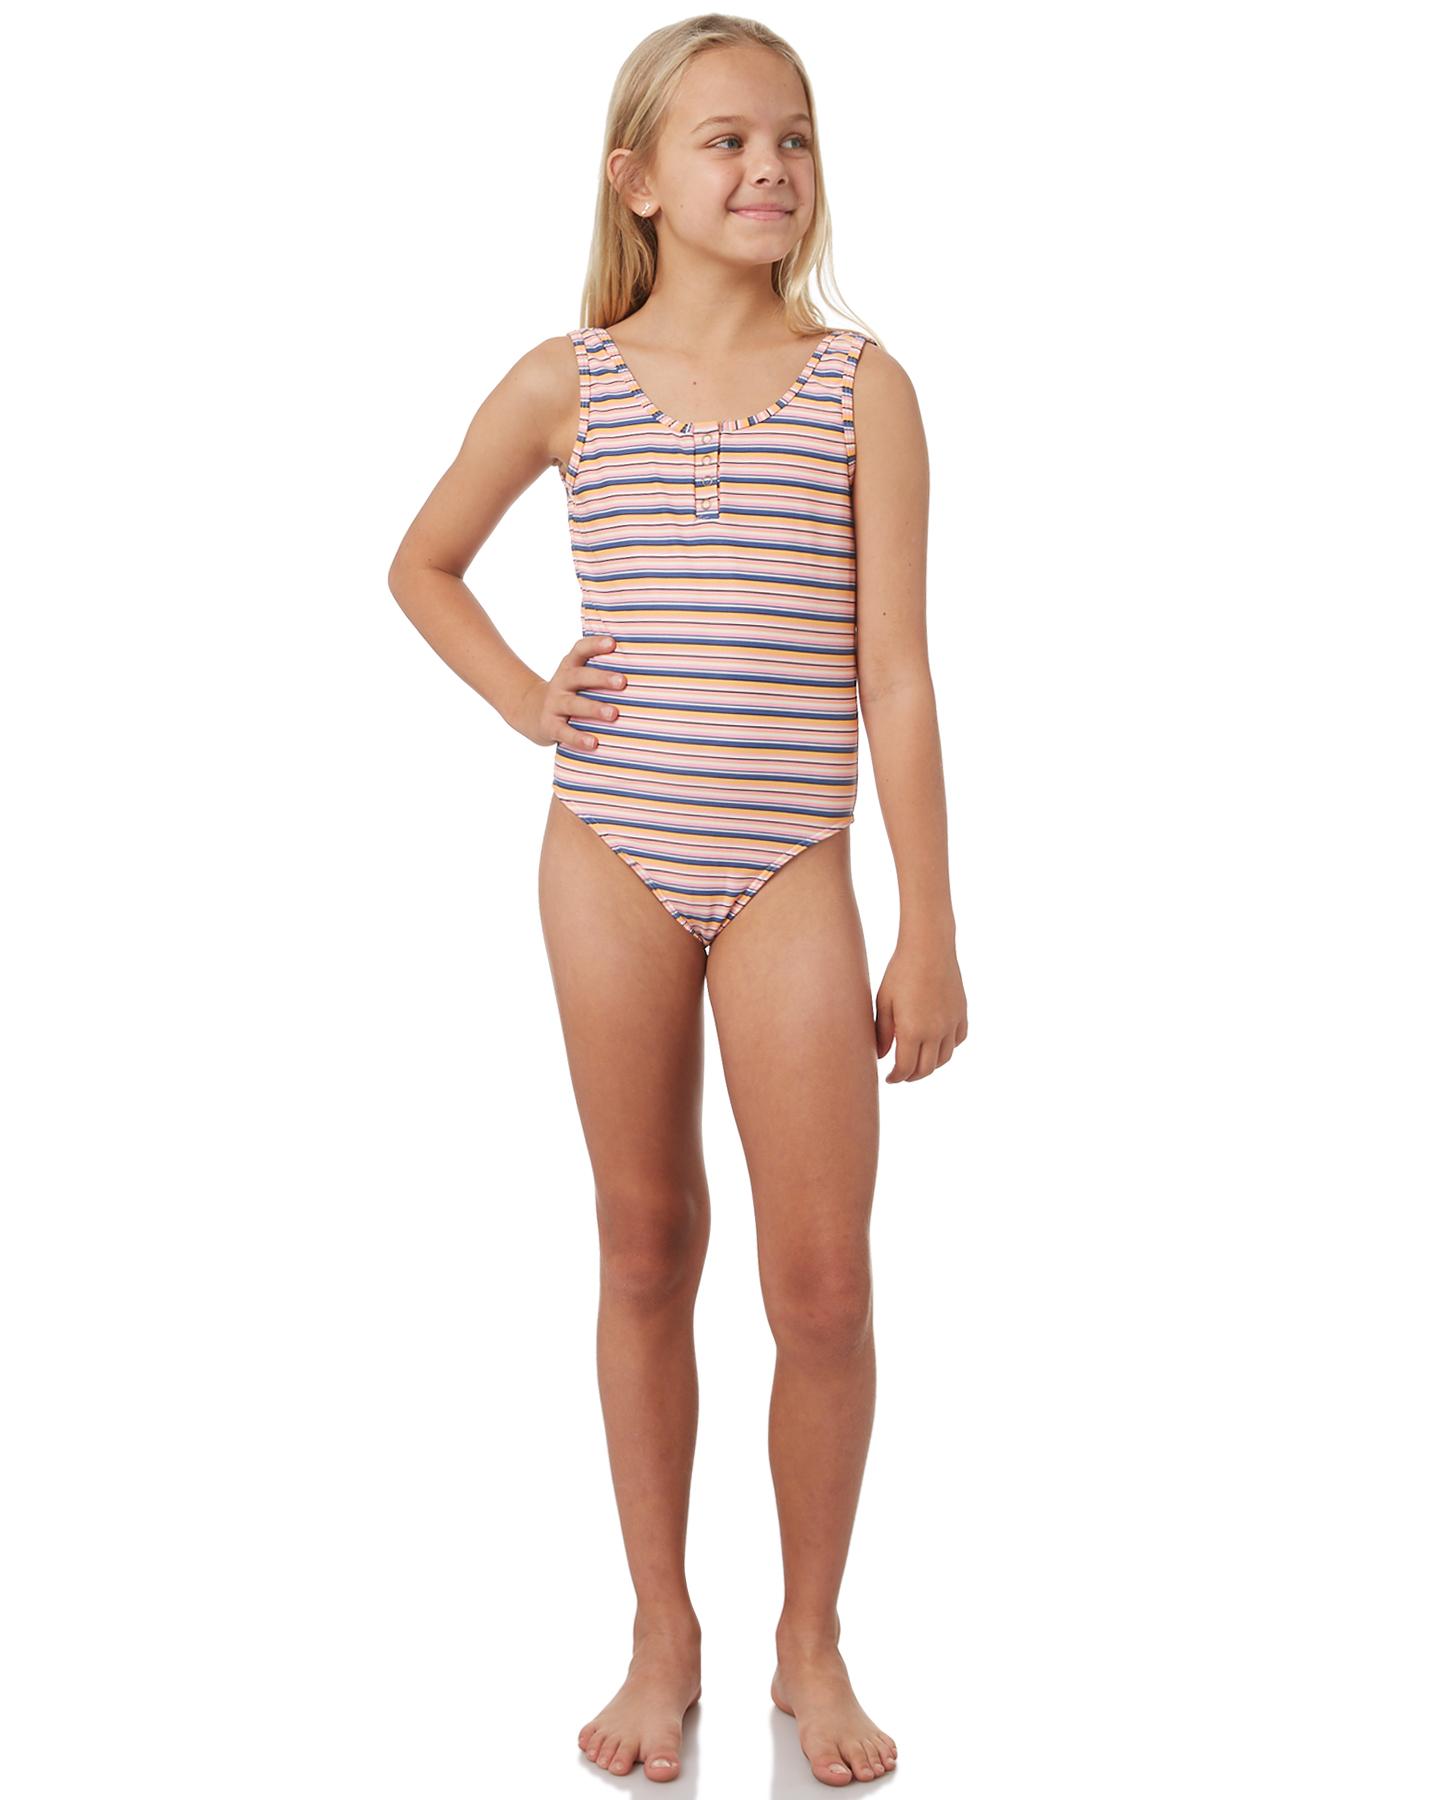 d6abf3ac5d47f Billabong Girls Girls Trippin Stripe One Piece - Teens Polyester Spandex  Orange